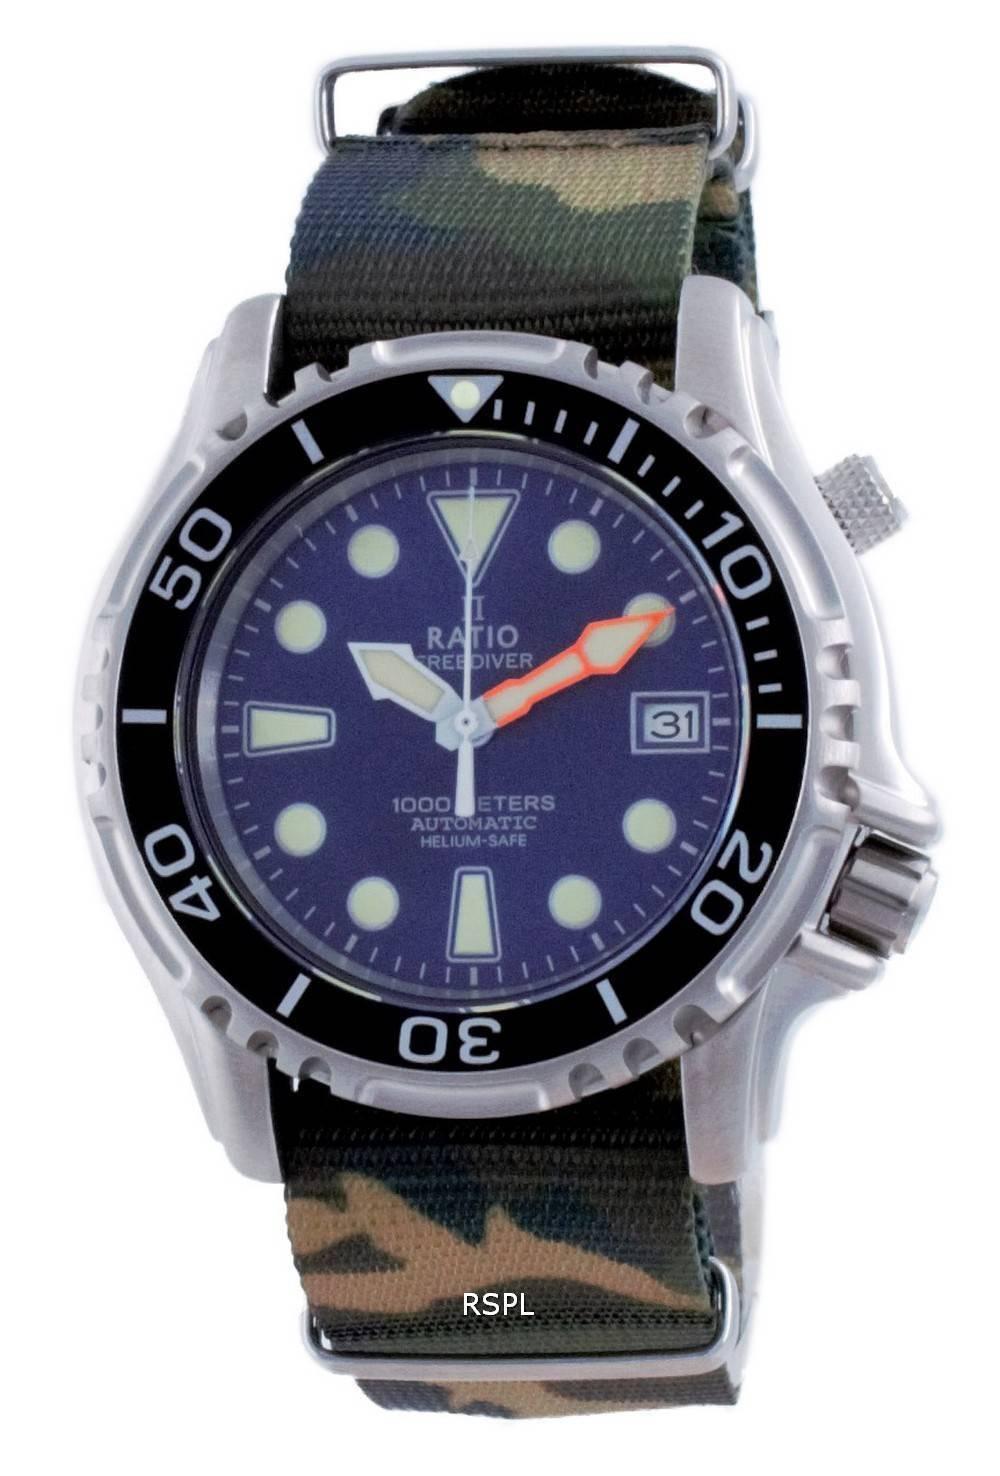 Suhde vapaa Diver Helium Safe Nylon Automatic Diver&#39,s 1066KE20-33VA-BLU-var-NATO5 1000M miesten kello